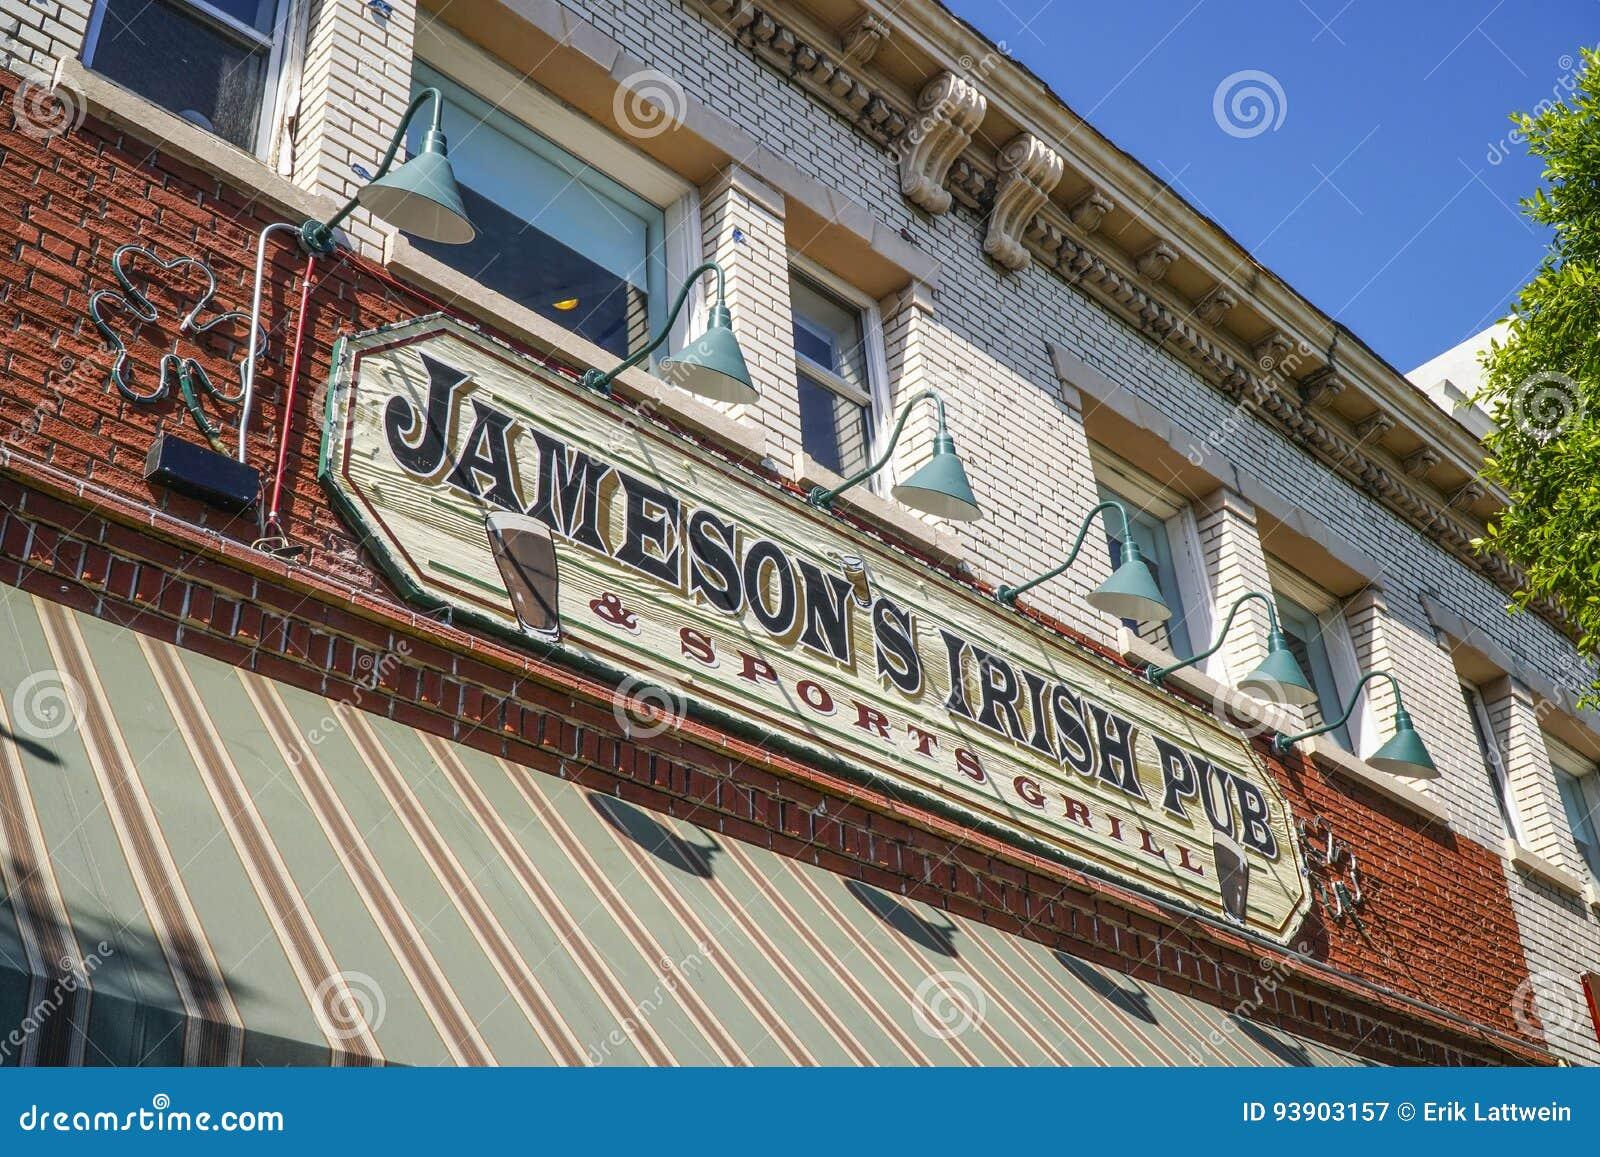 Jameson Irish Pub in Los Angeles in Hollywood Blvd - LOS ANGELES - CALIFORNIË - APRIL 20, 2017